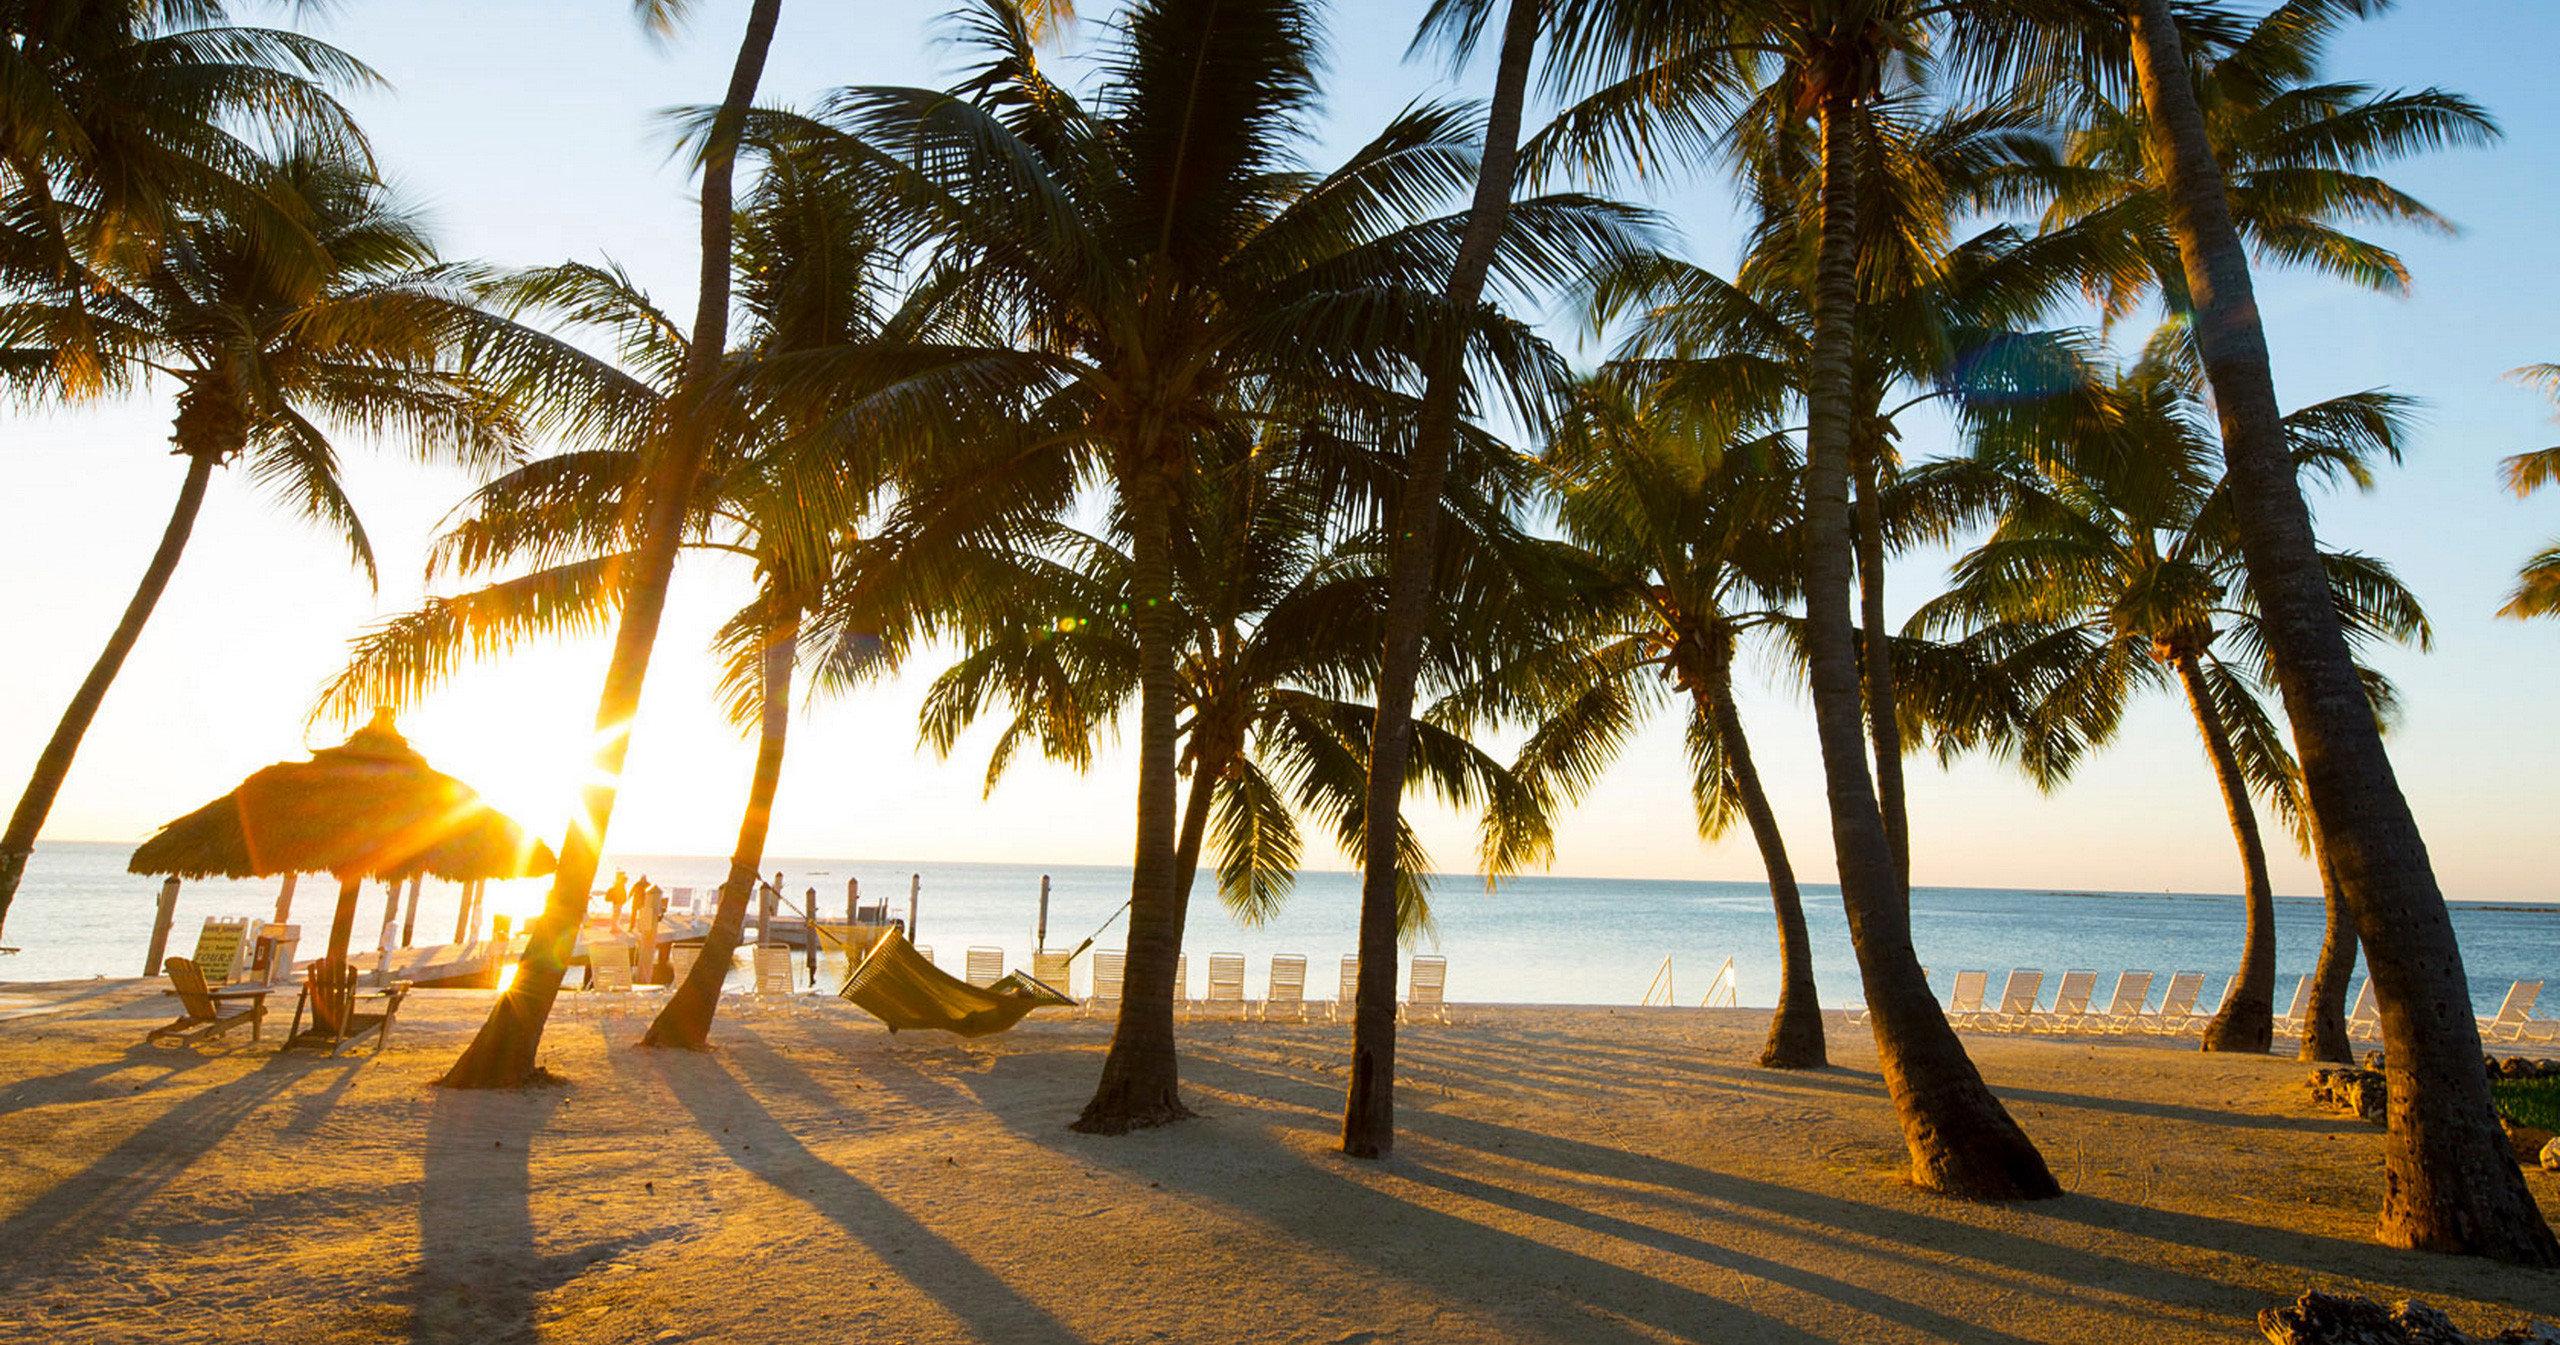 Beach Beachfront Hotels Resort Romance Scenic views water tree sky palm plant Ocean palm family Sea arecales morning sunlight woody plant Sunset Coast tropics sandy lined Lake shade shore